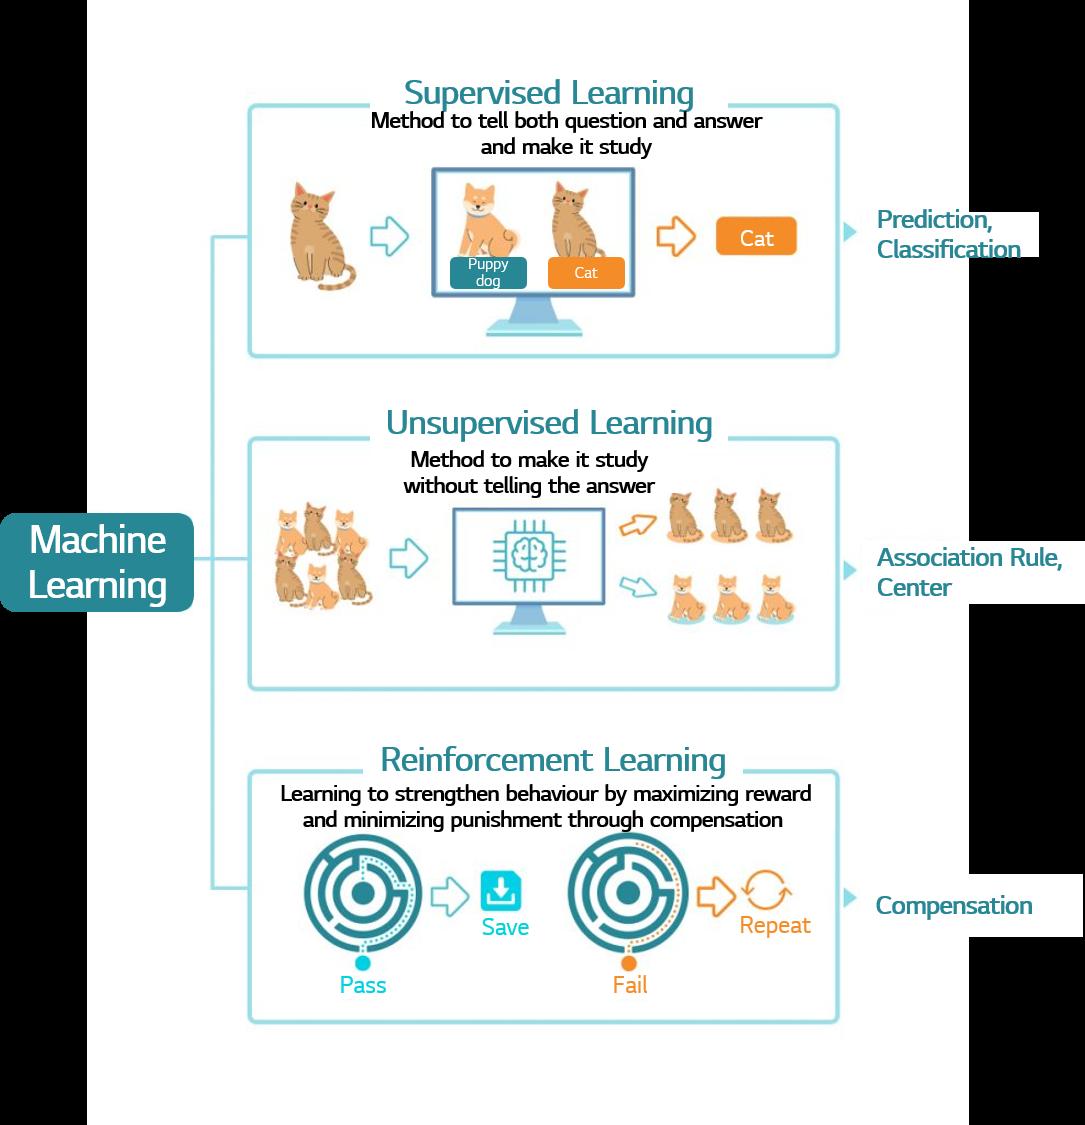 Three training methods for Machine Learning